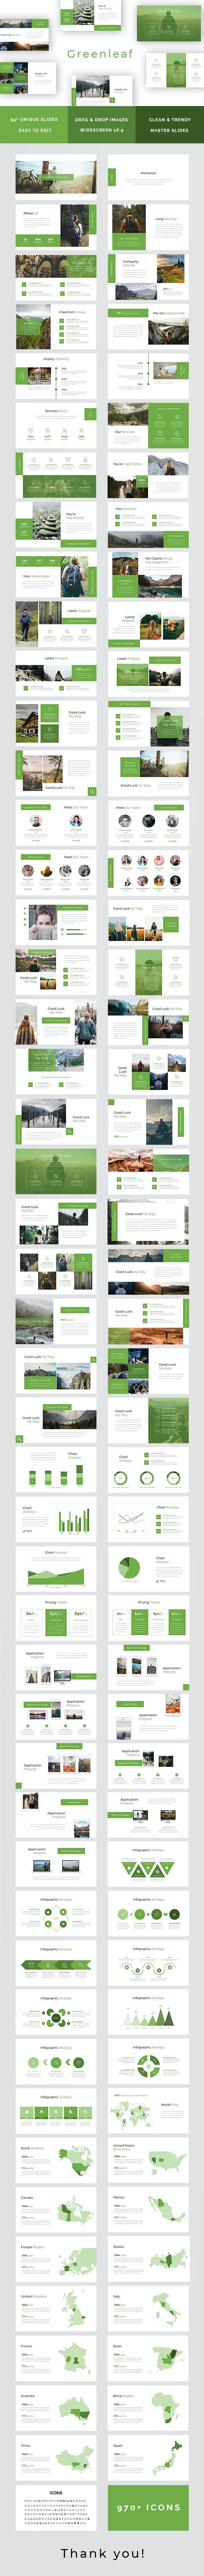 Greenleaf Powerpoint Template - PowerPoint Templates Presentation Templates